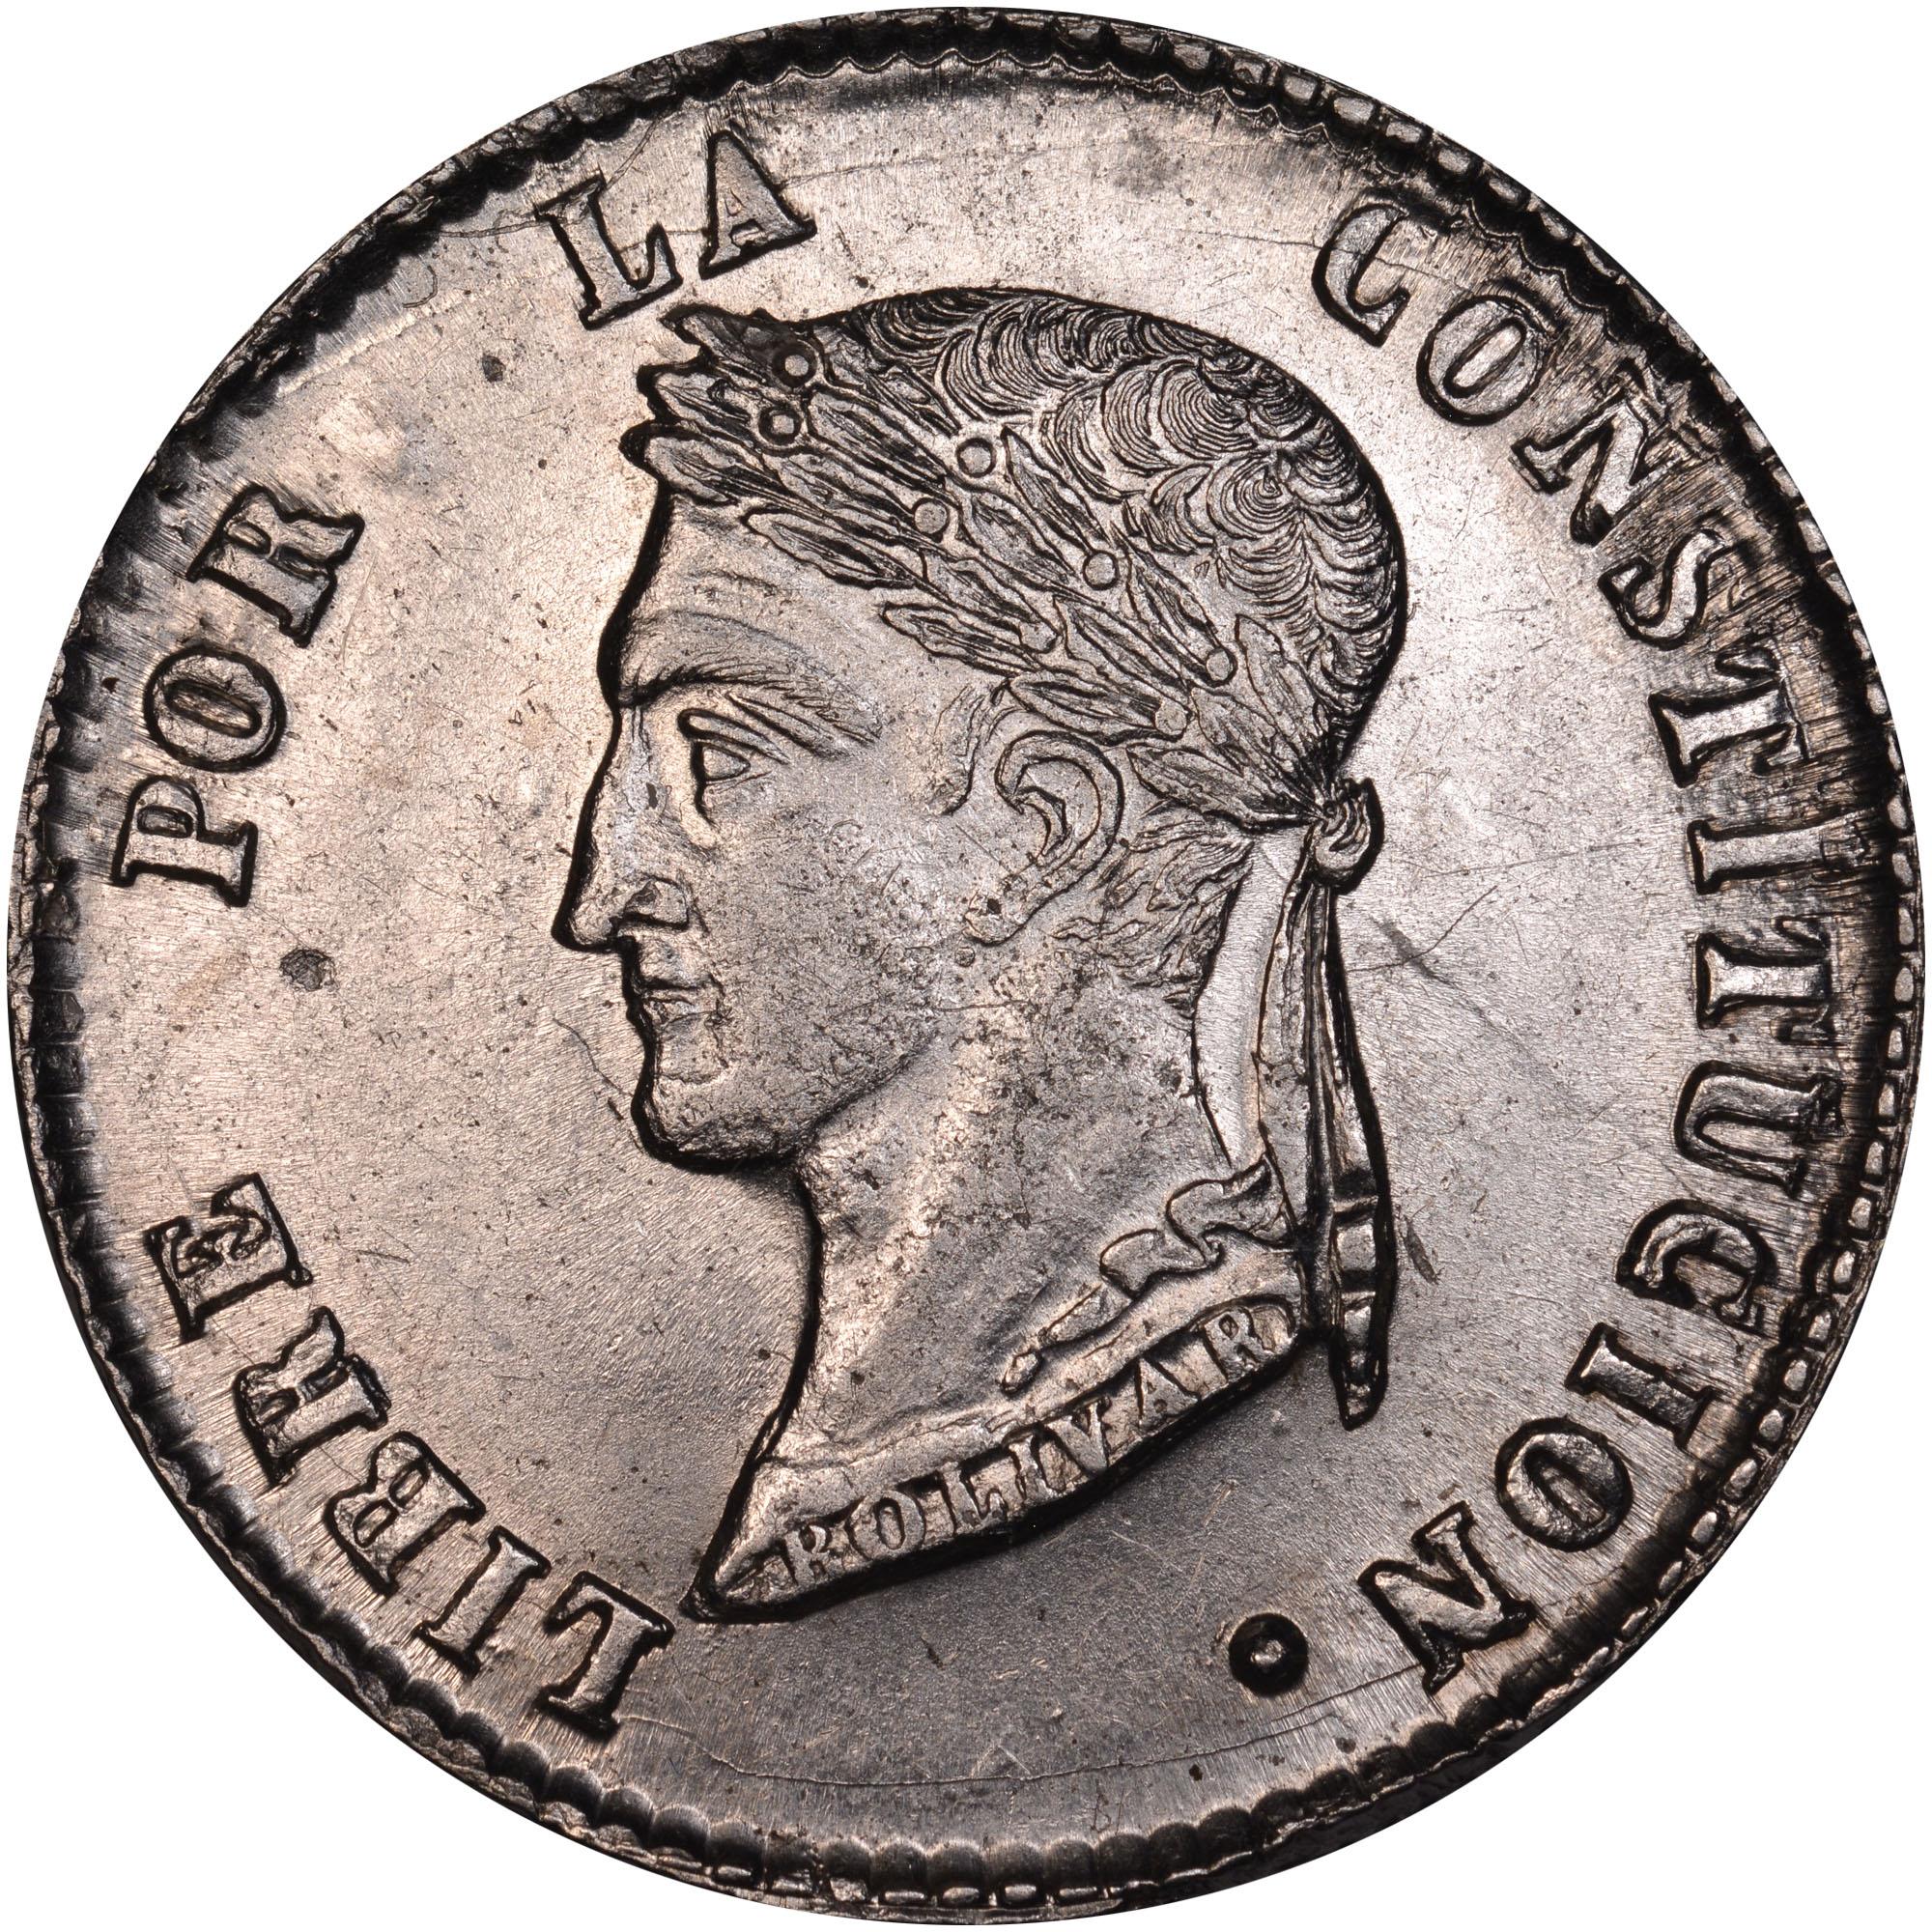 1853-1858 Bolivia 4 Soles reverse